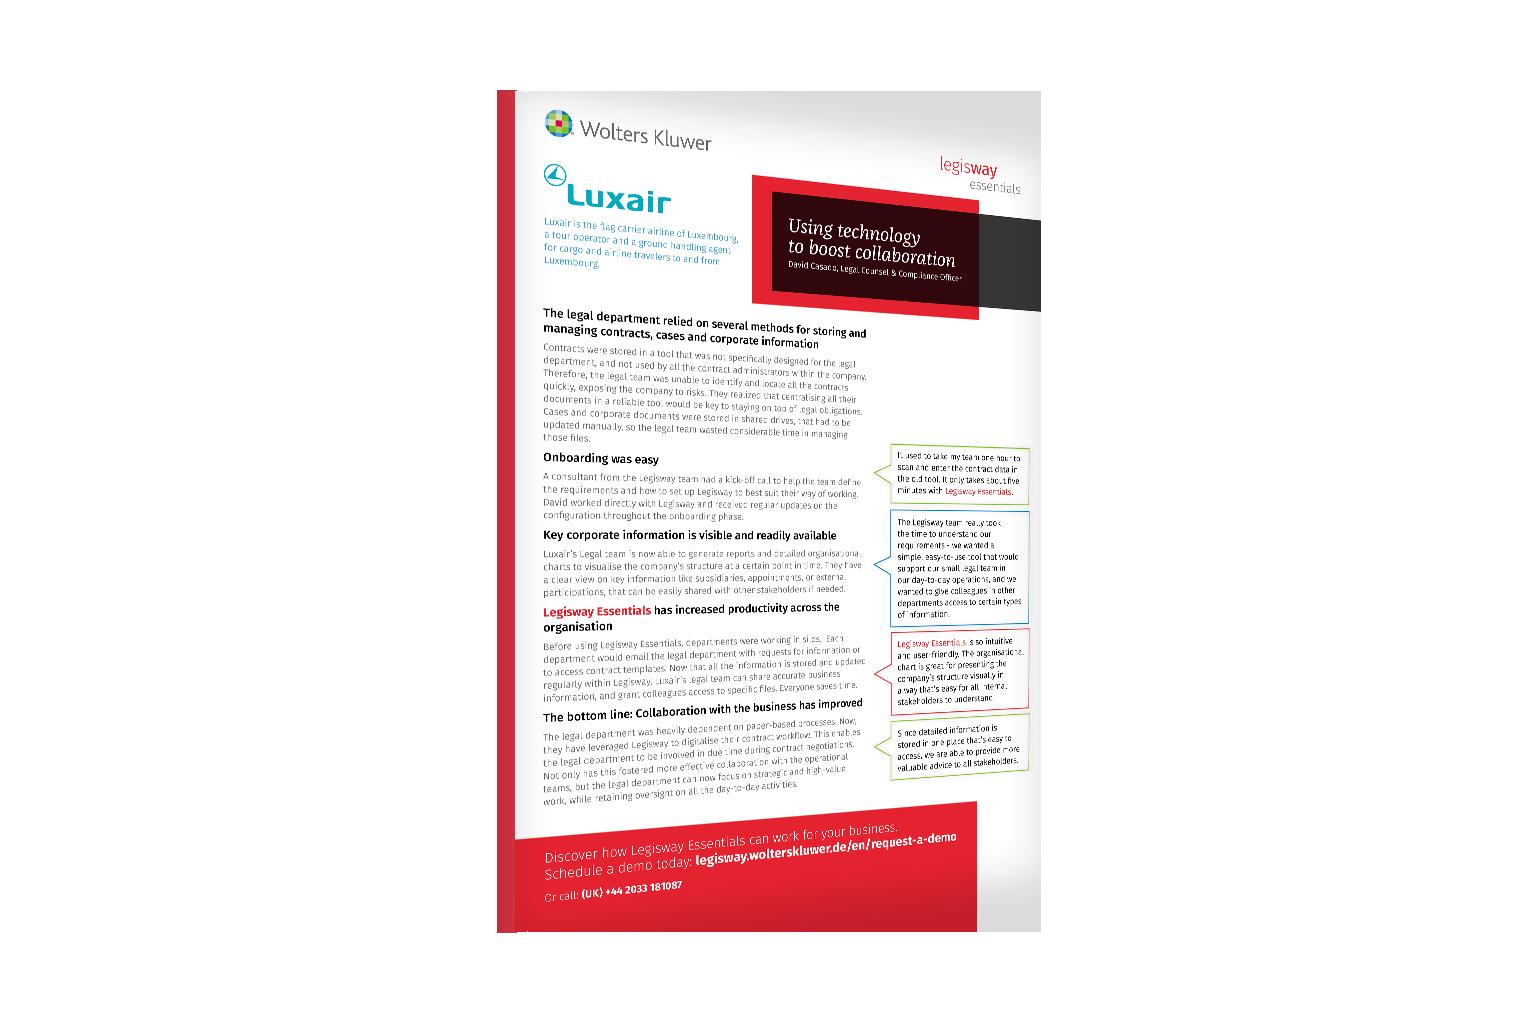 Legisway-cover-case-study-luxair-1536x1024